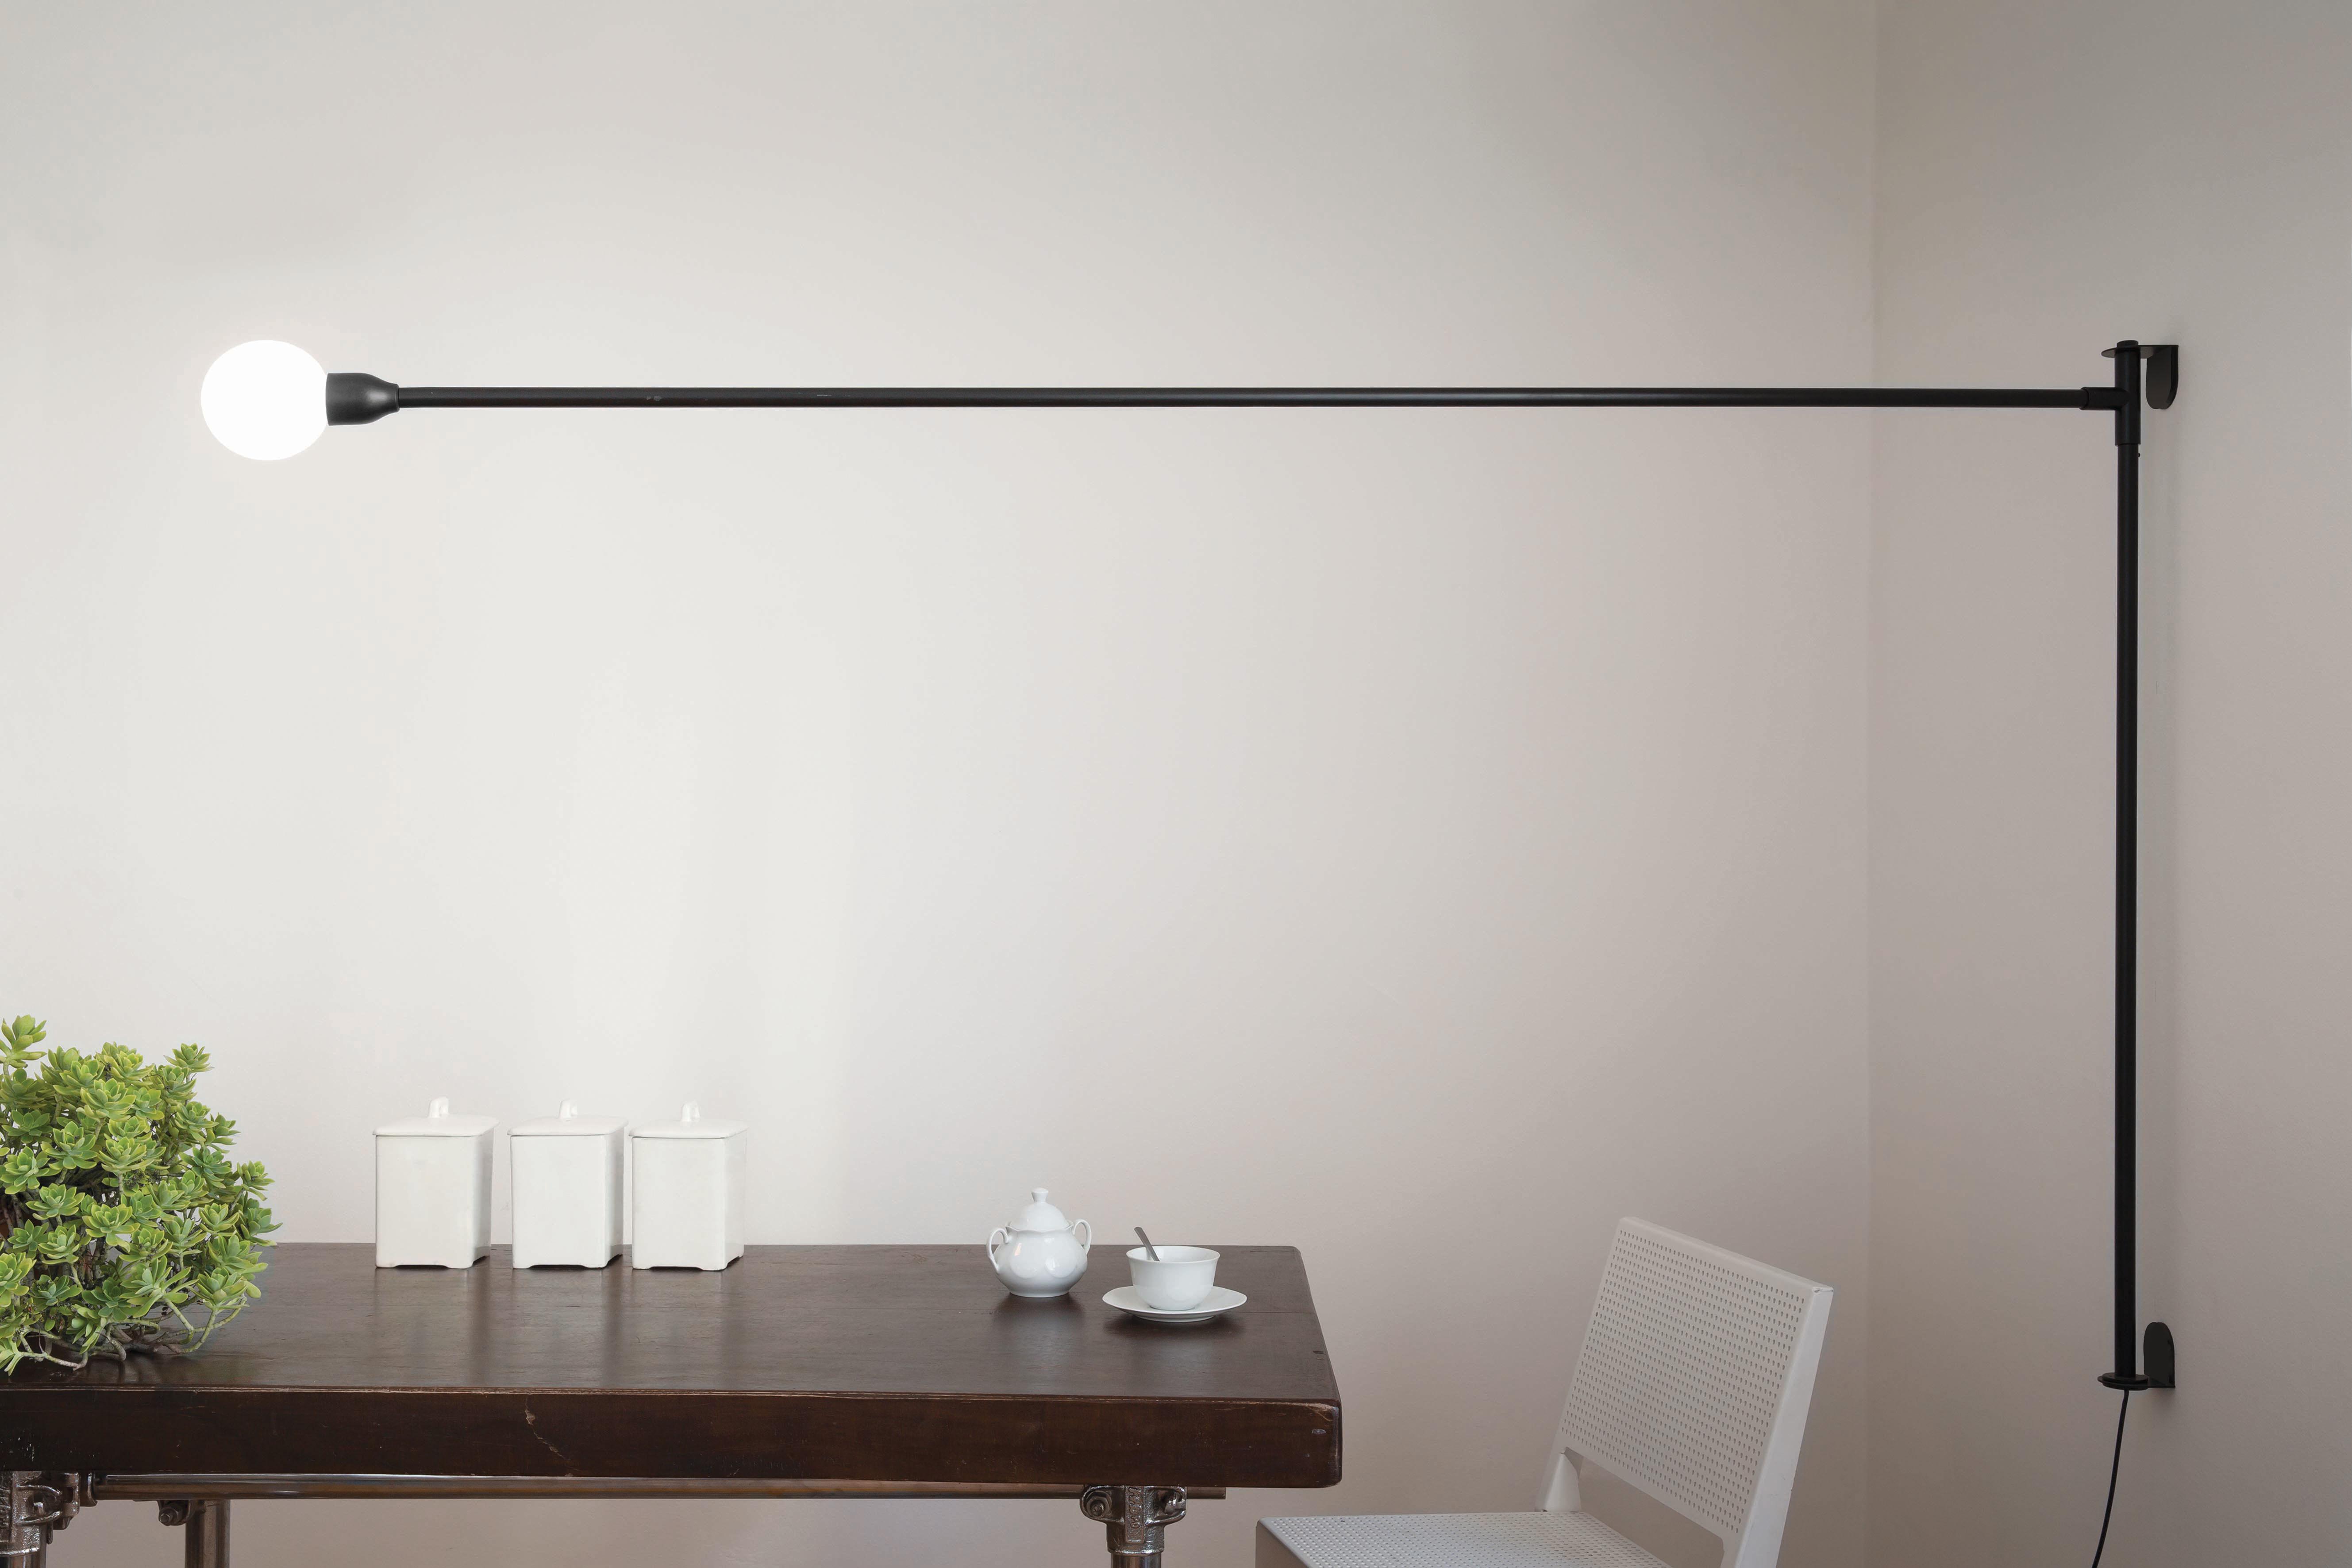 applique potence pivotante by charlotte perriand r dition 1938 l 200 cm noir nemo. Black Bedroom Furniture Sets. Home Design Ideas